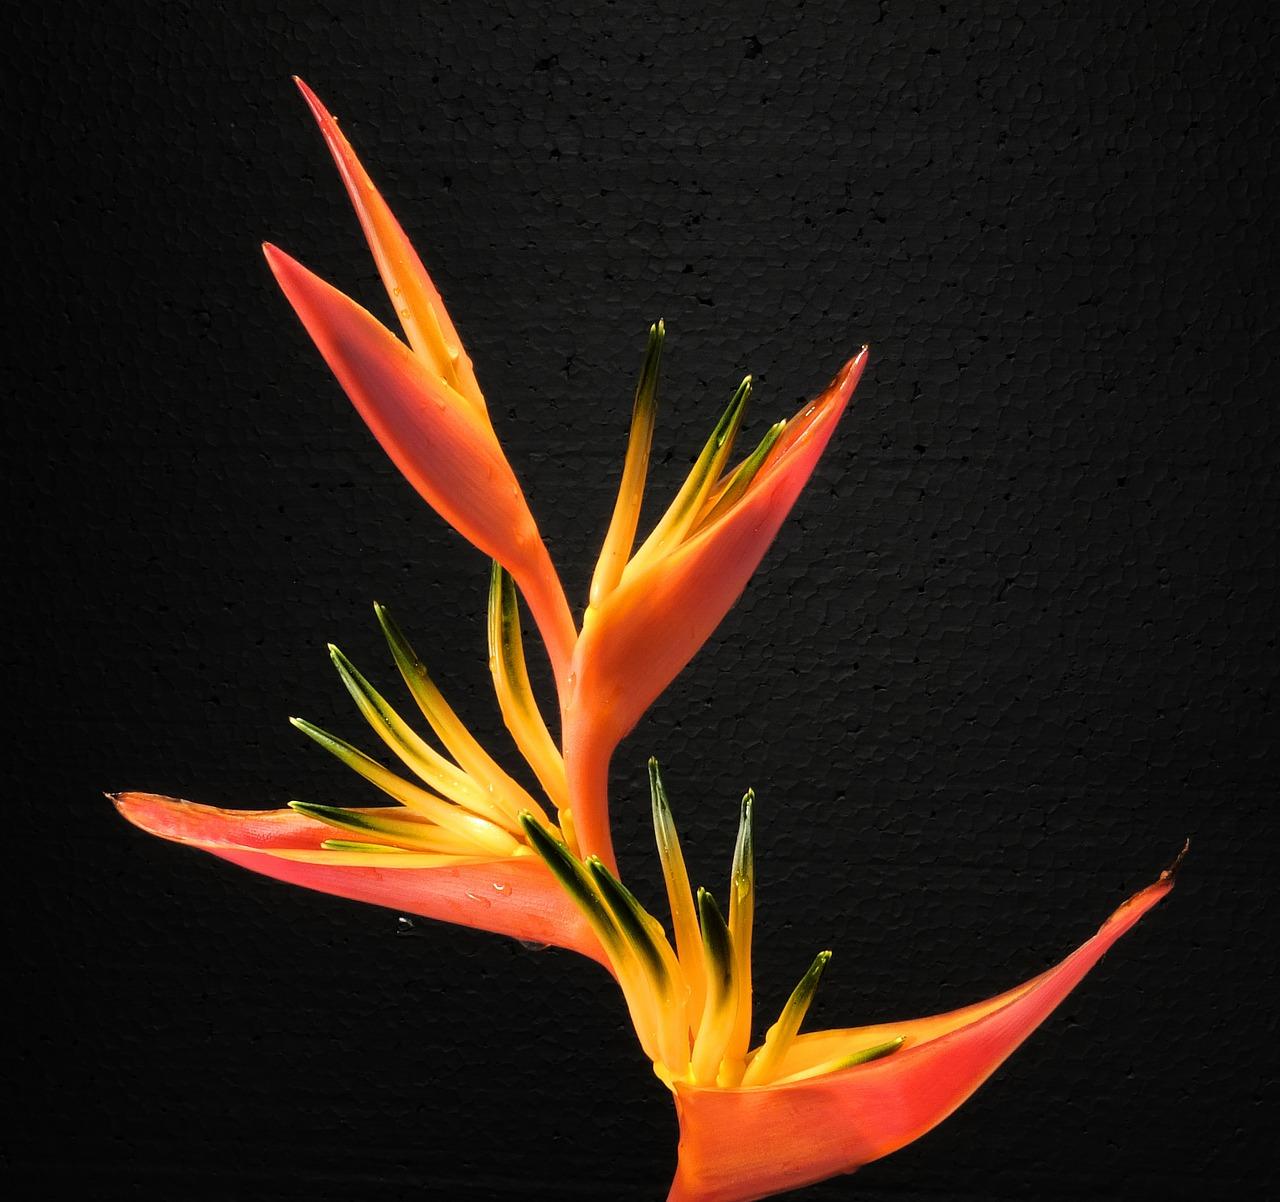 Bird Of Paradise Flowercaudatablossombloomflower Free Photo